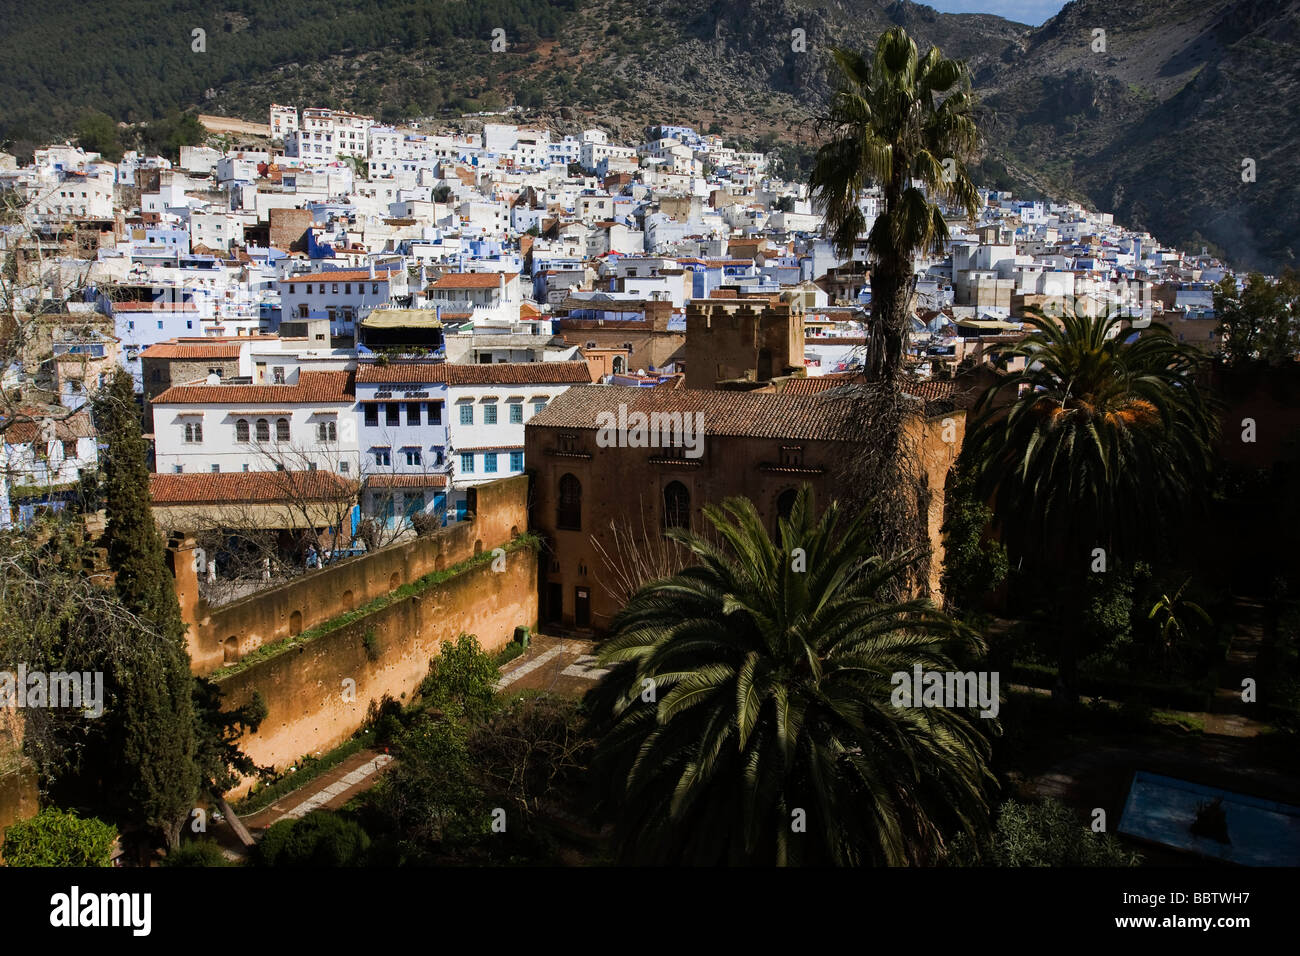 Blick vom Kasbah, Chefchaouen, Marokko, Nordafrika Stockbild